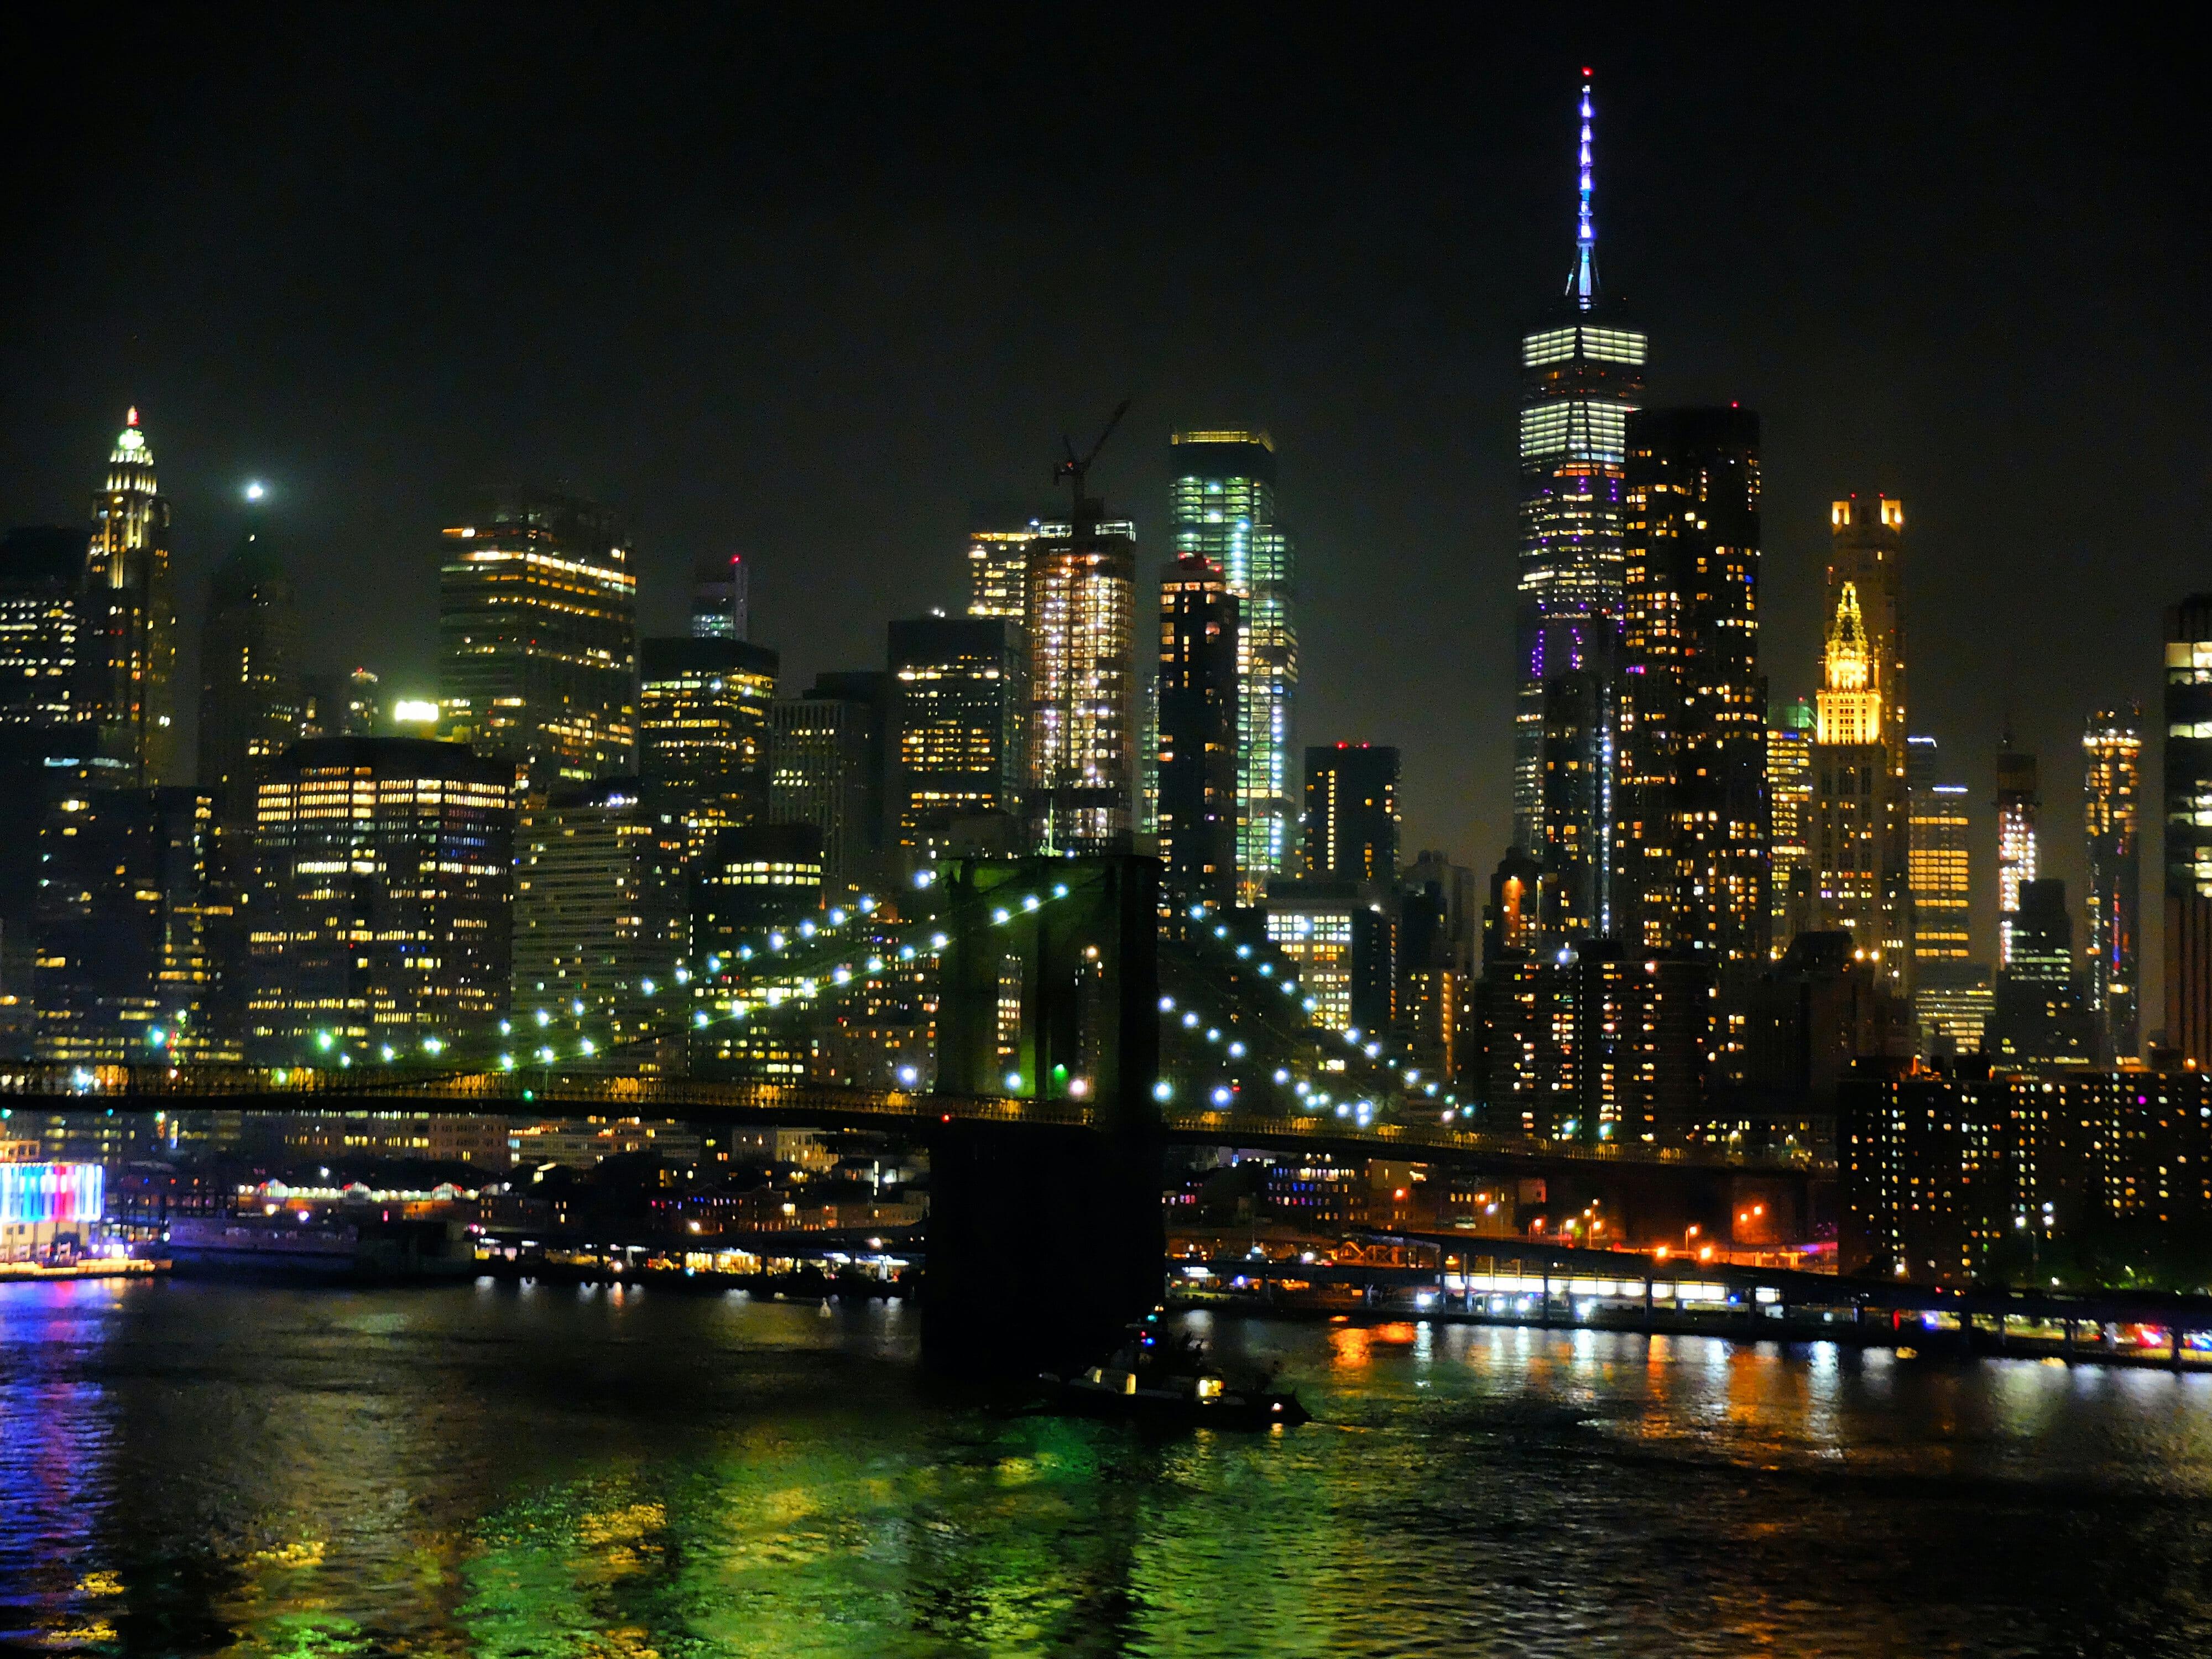 New York Skyline at Night High Quality Wallpaper